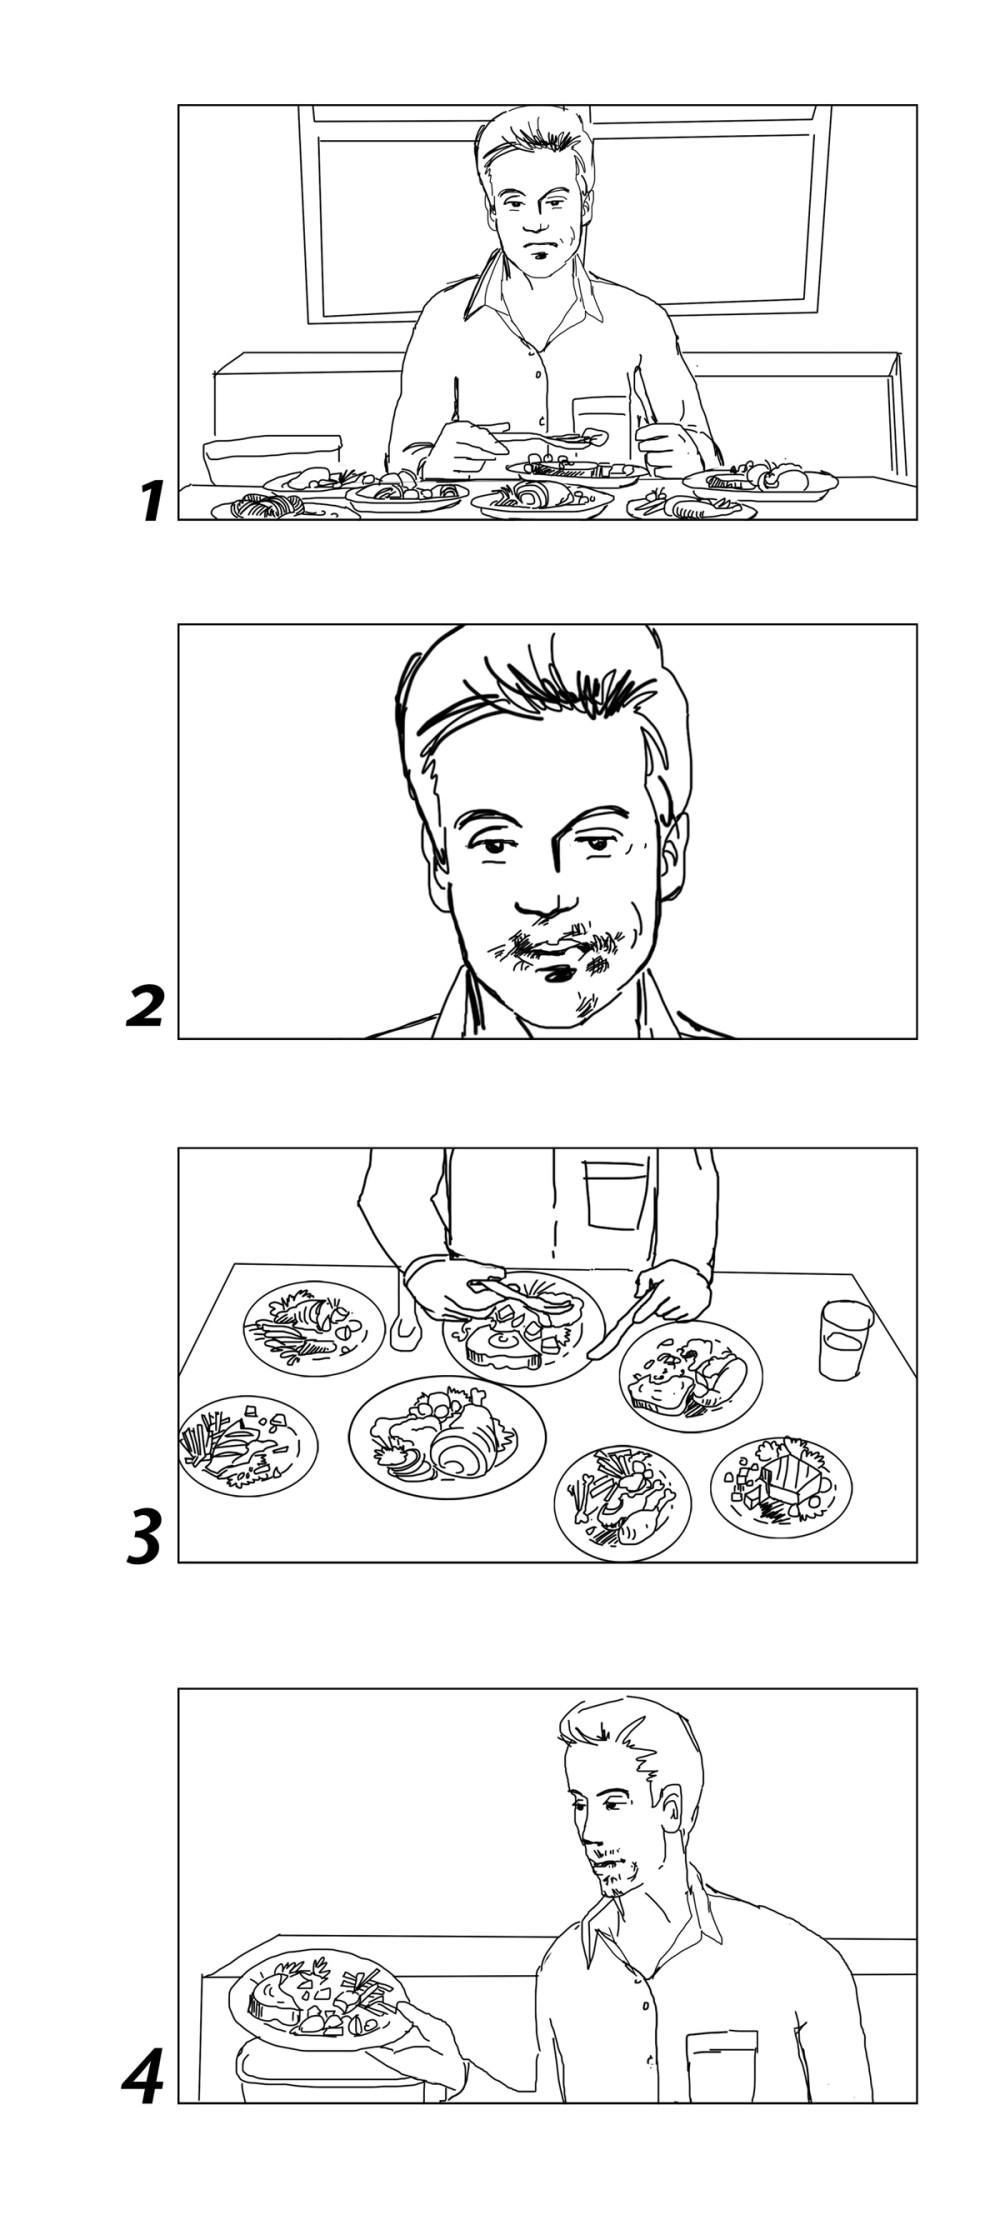 konsumheld food waste storyboards portfolio1